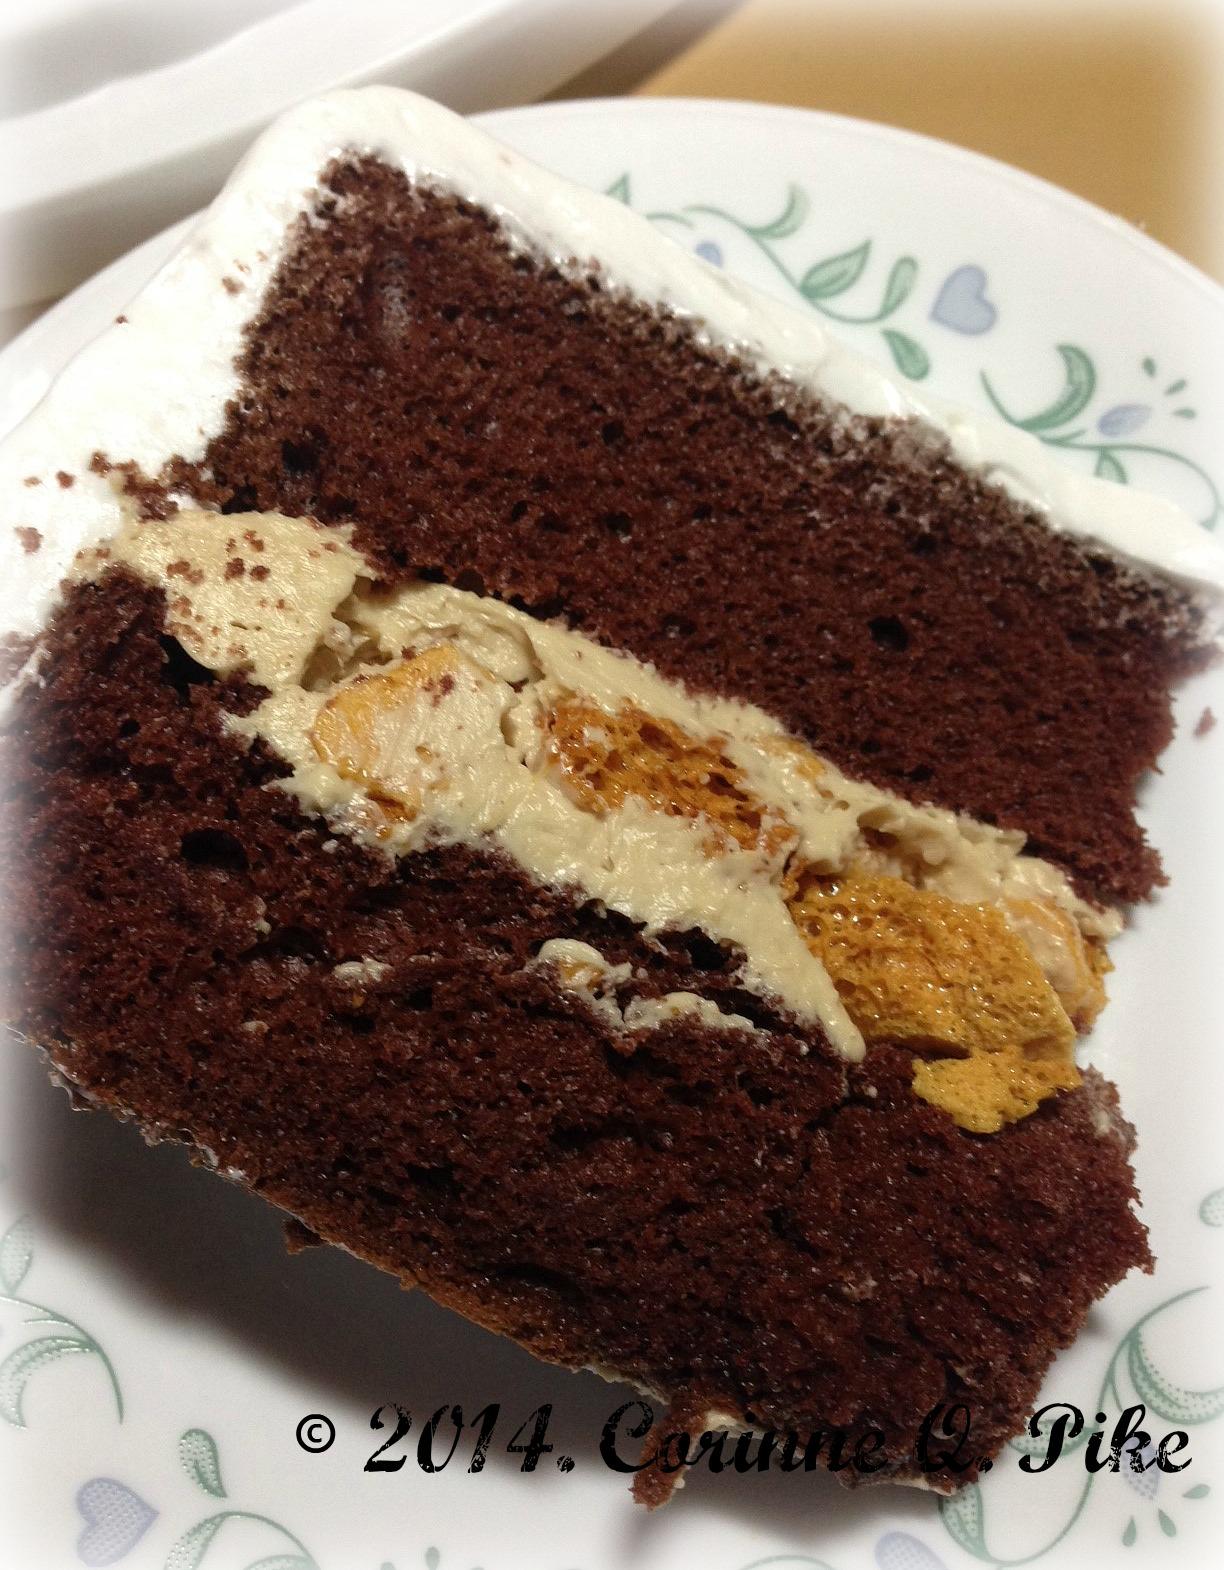 Cake Red Ribbon Recipe : Mocha crunch cake red ribbon recipe - Photo recipes